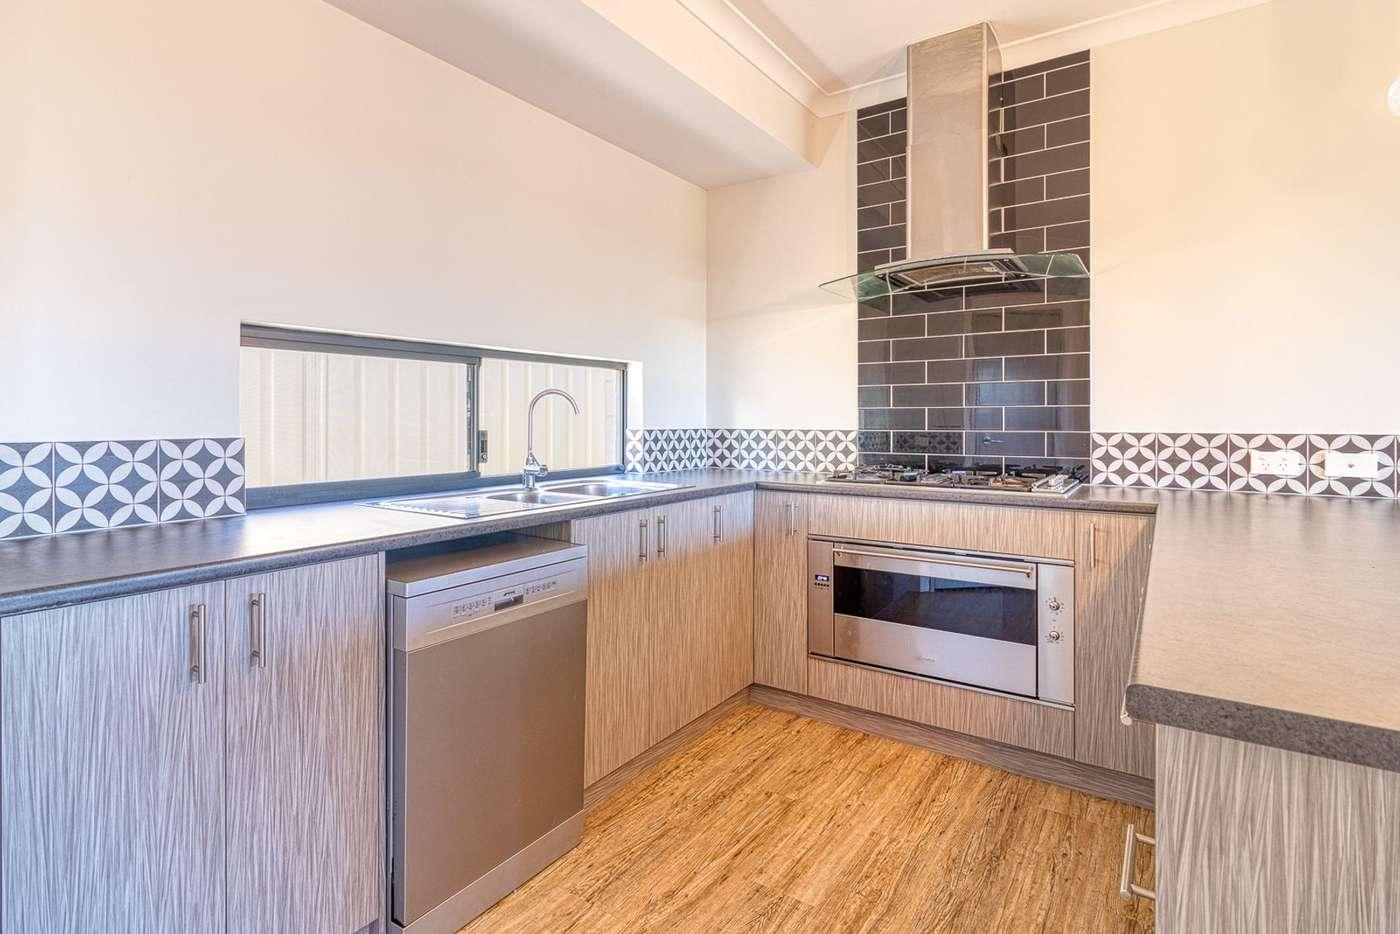 Seventh view of Homely house listing, 2 Medinah Street, Dunsborough WA 6281